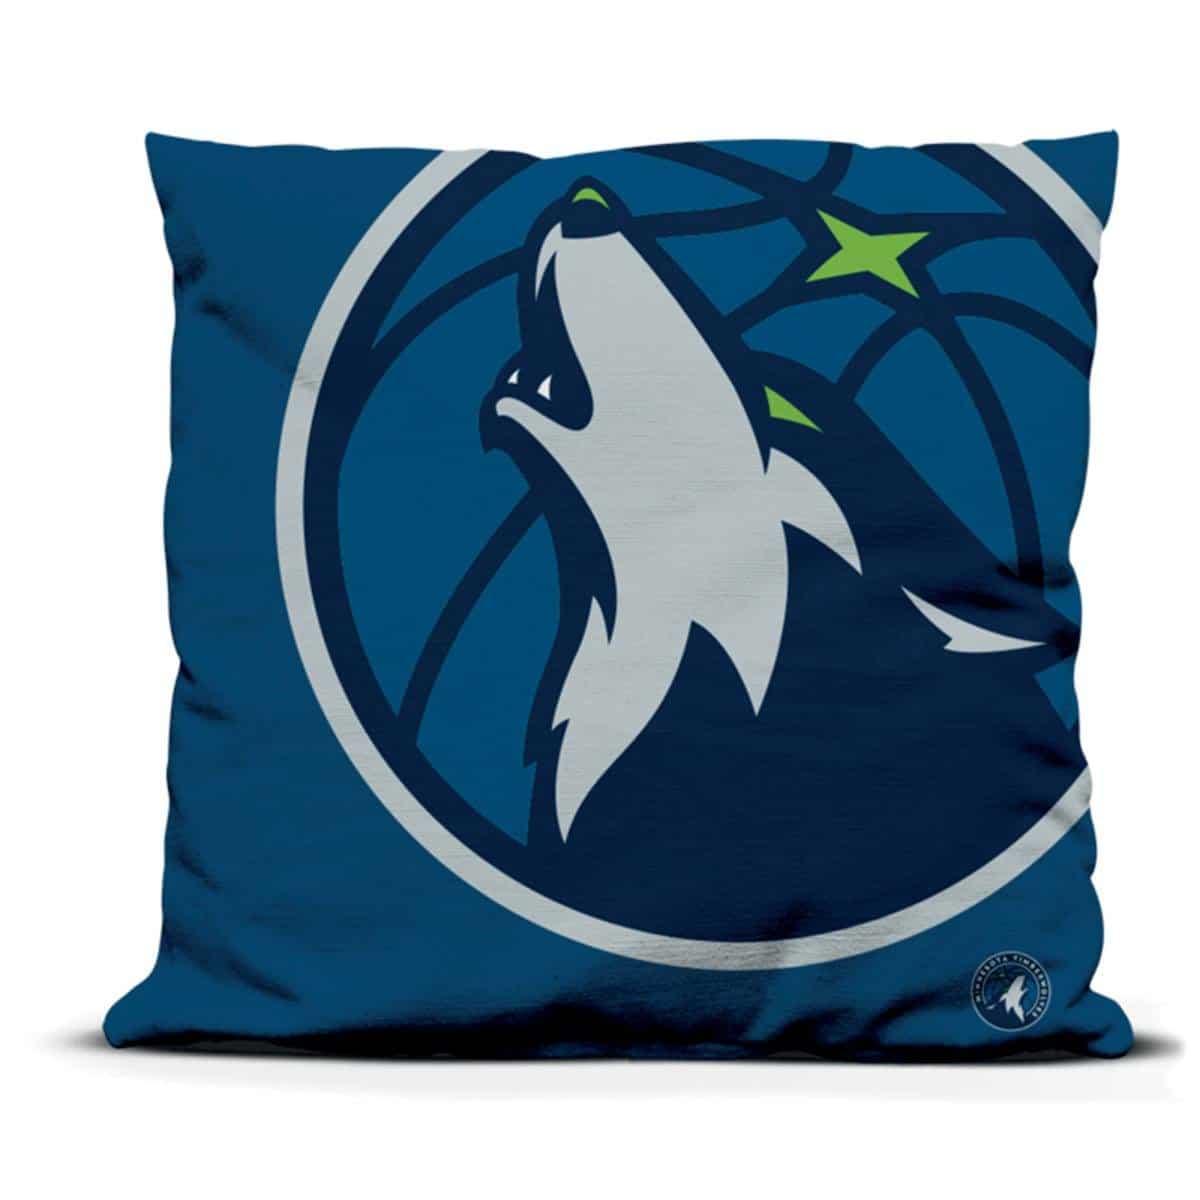 Almofada do Minnesota Timberwolves